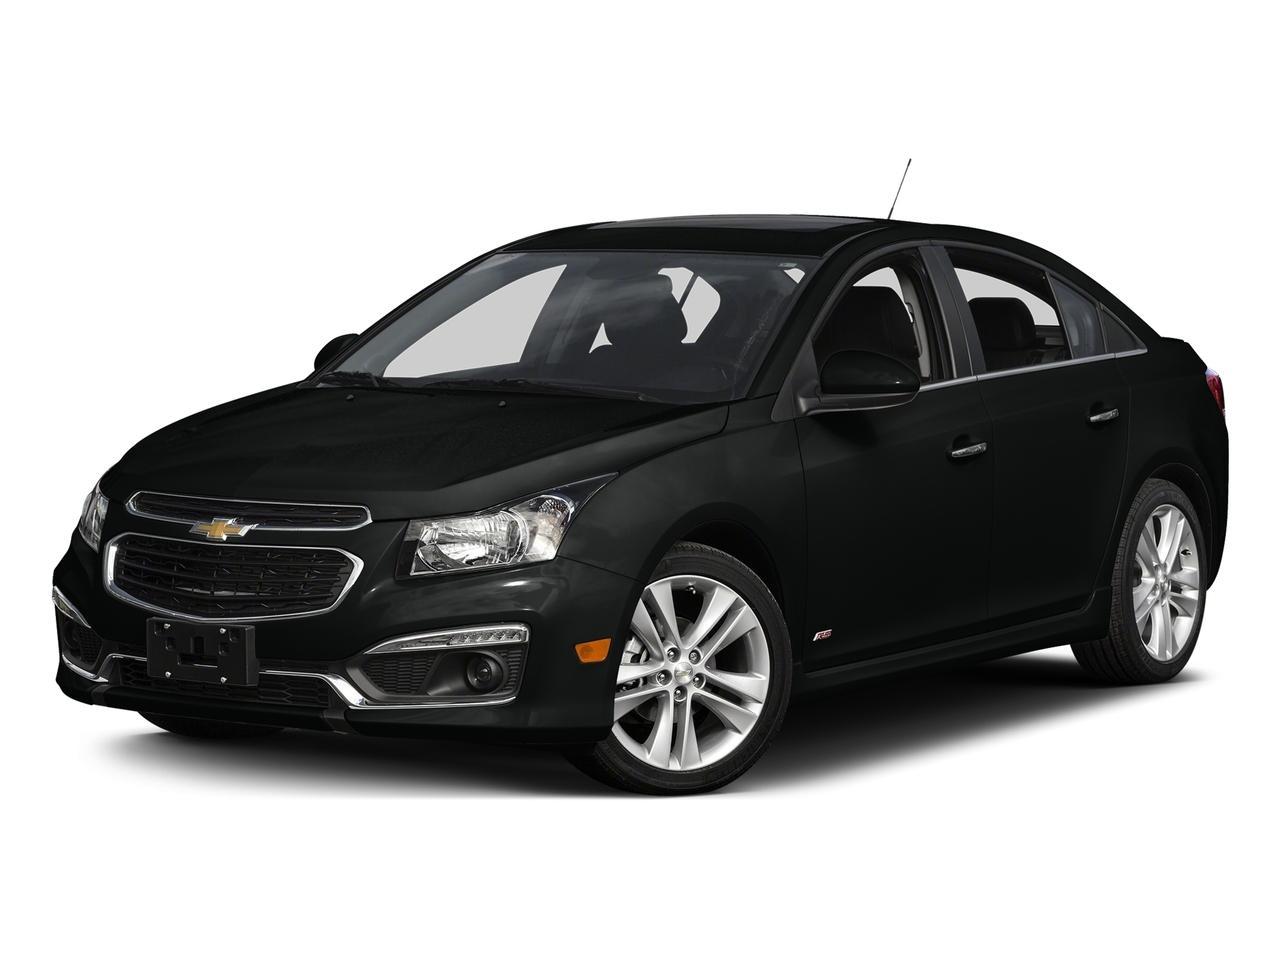 2015 Chevrolet Cruze Vehicle Photo in OAK LAWN, IL 60453-2560